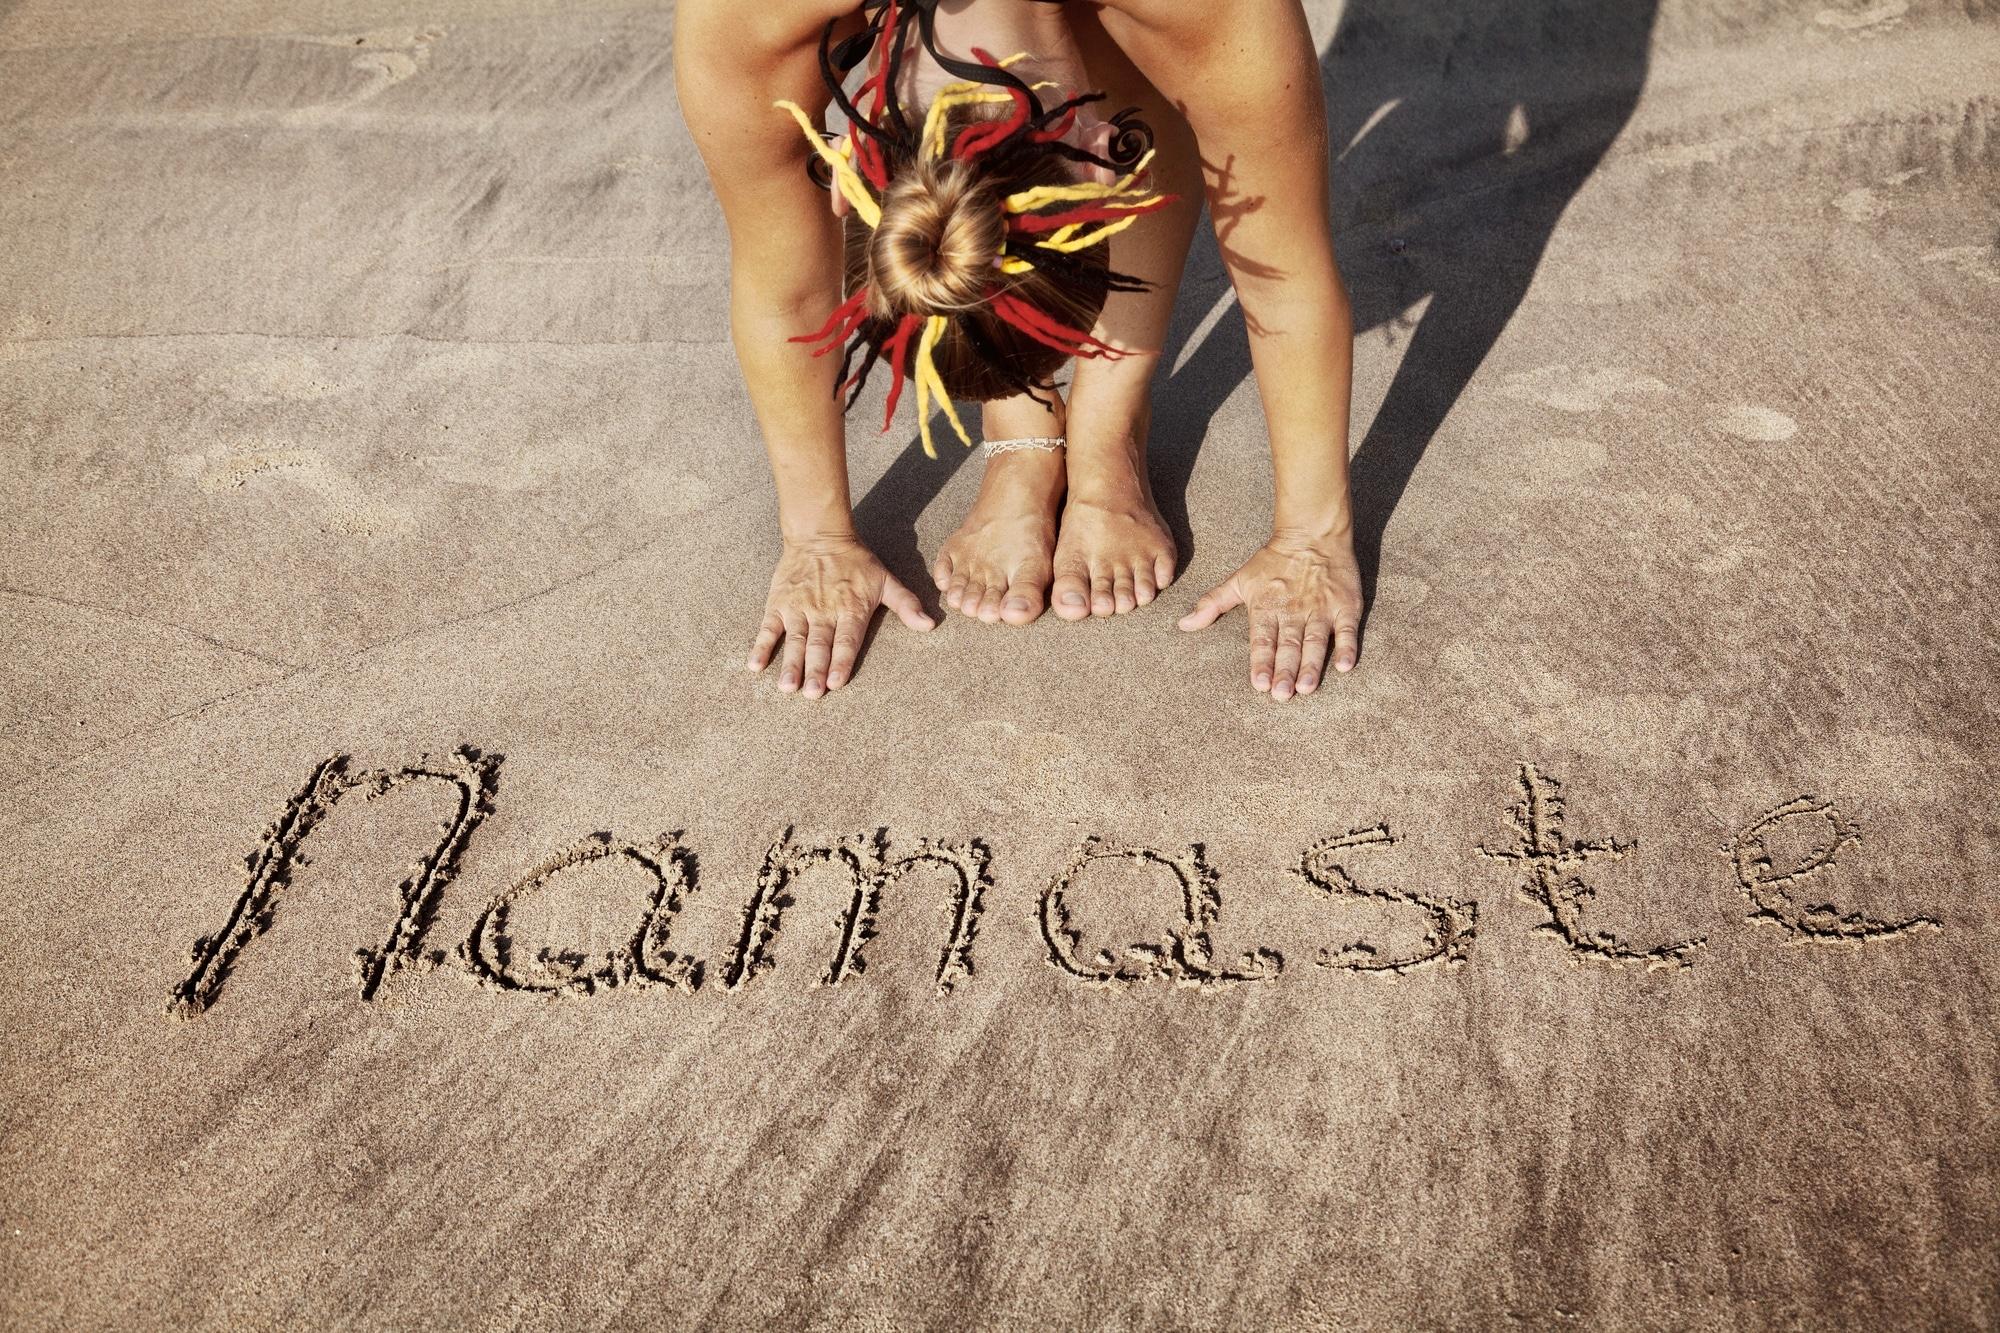 Woman doing yoga on the beach near Namaste handwriting in Goa, India